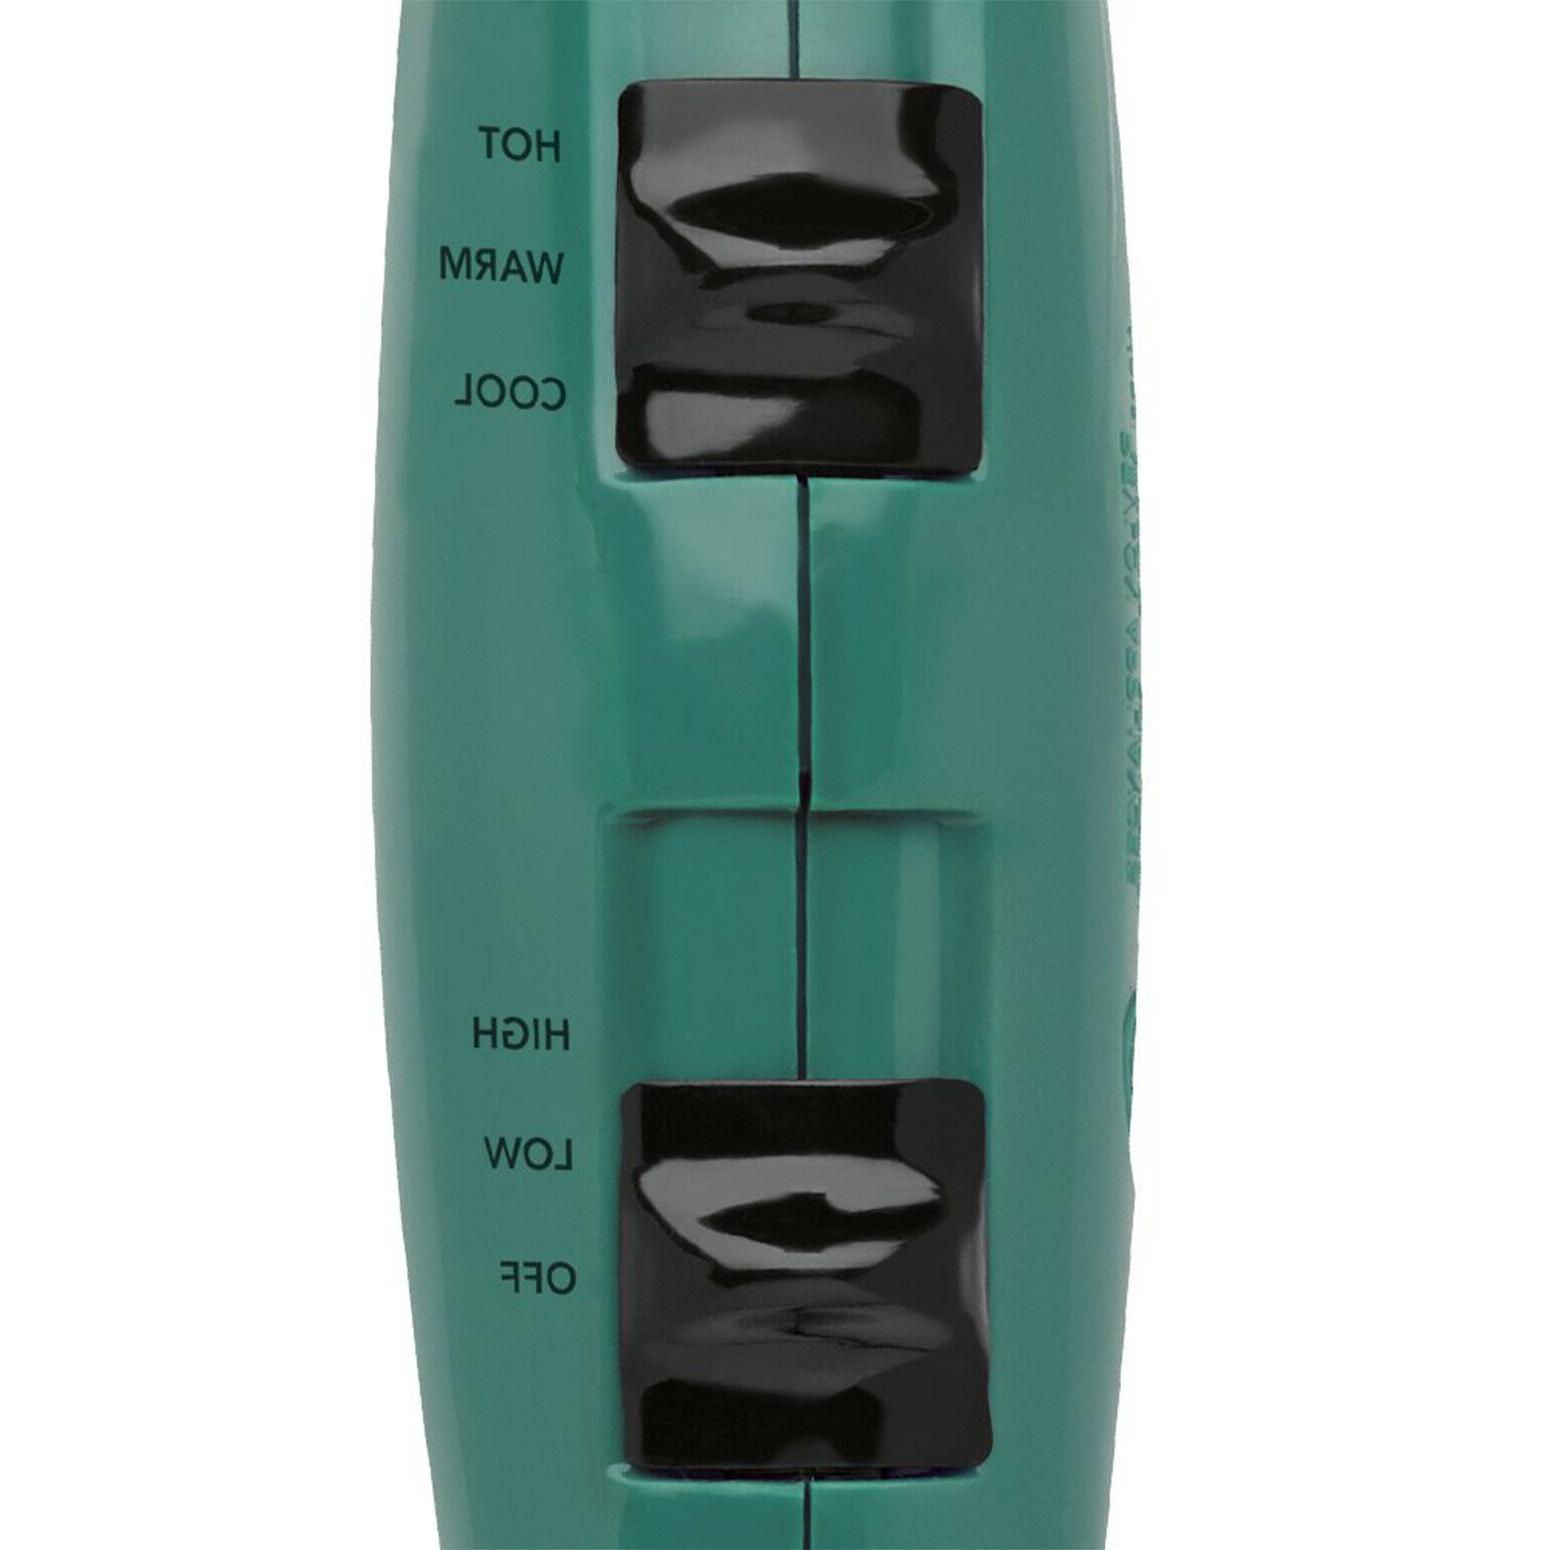 Revlon Professional Ionic 2 Diffuser